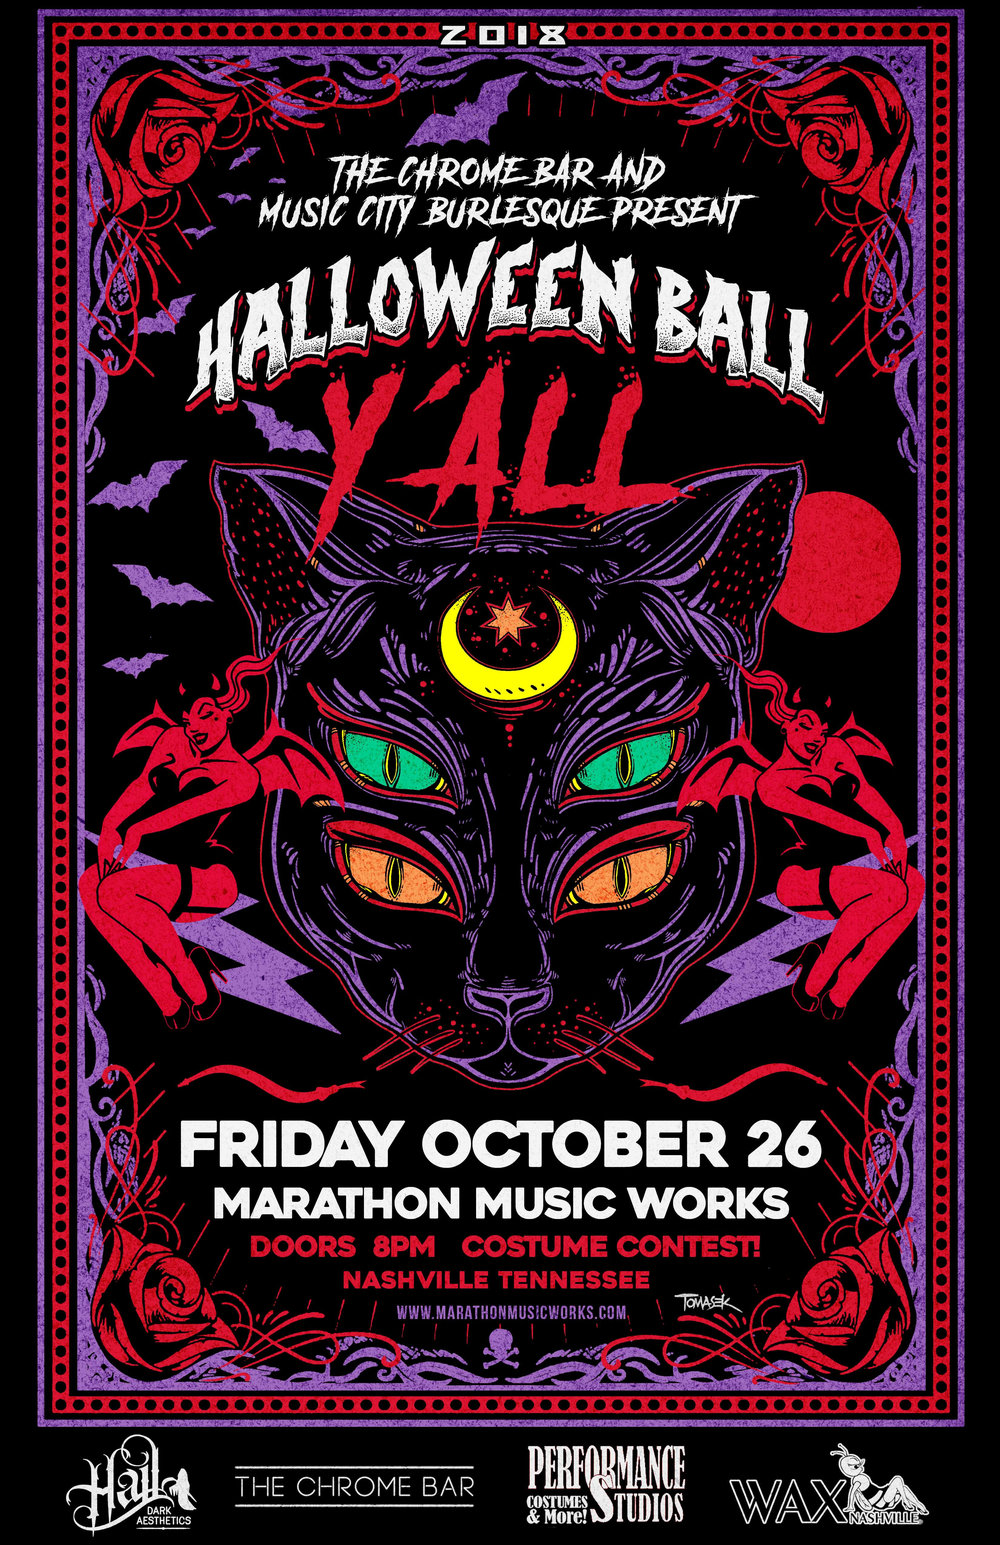 HalloweenBallYall.jpg